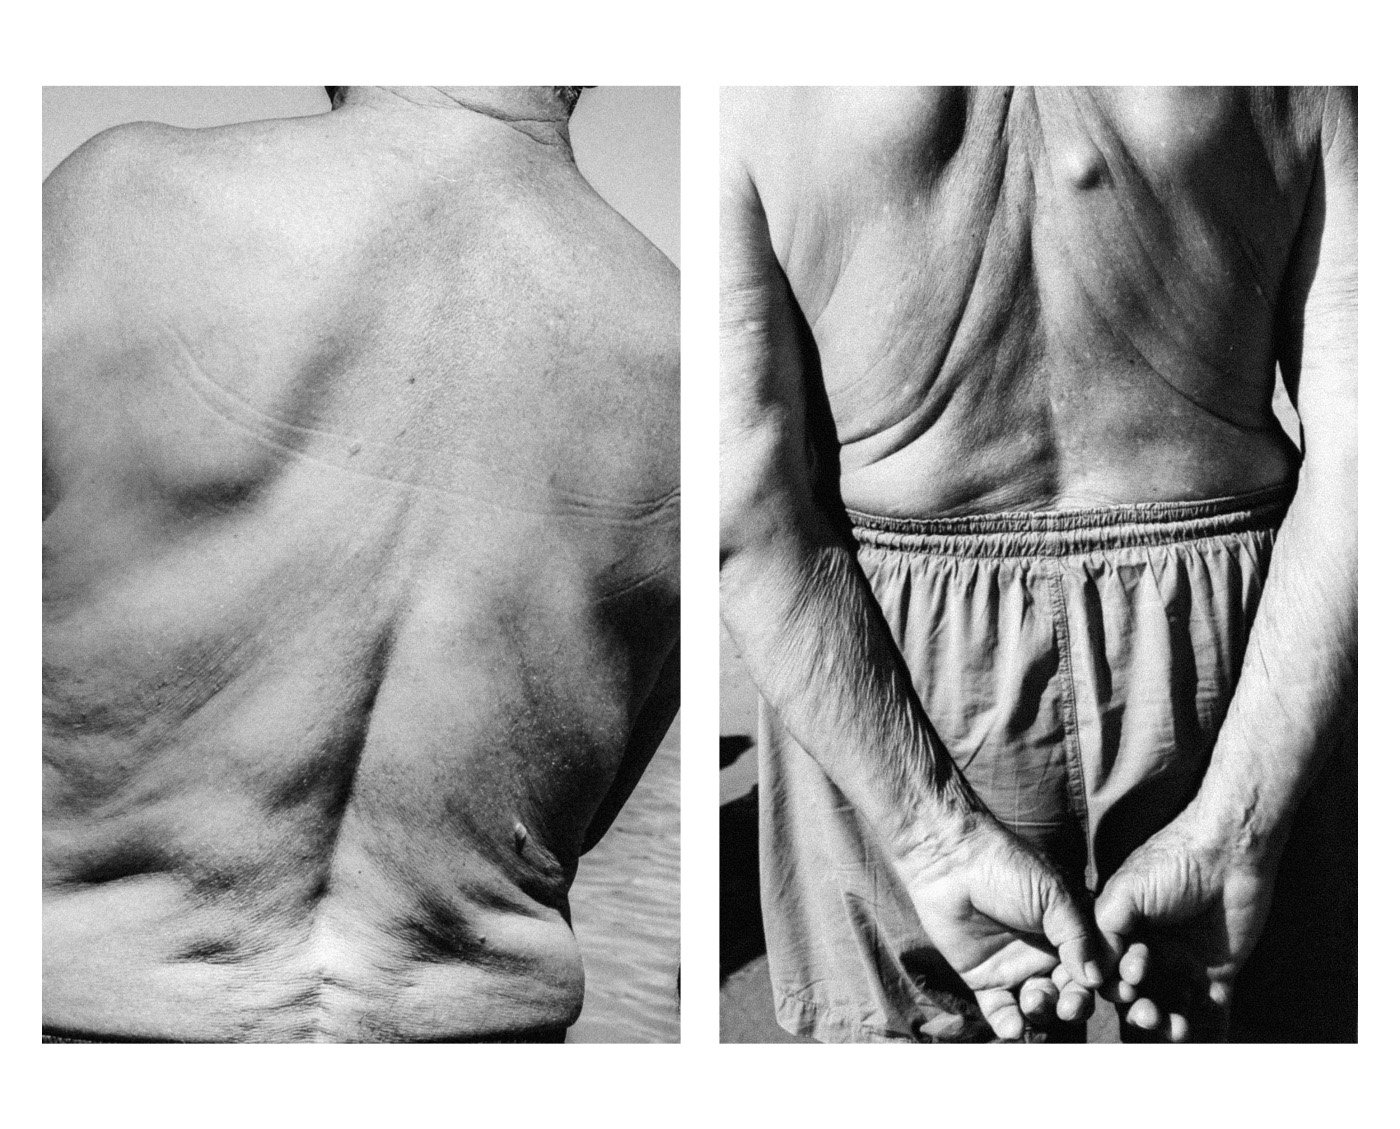 iGNANT-Photography-Antonio-Privitera-La-Nostalgia-07